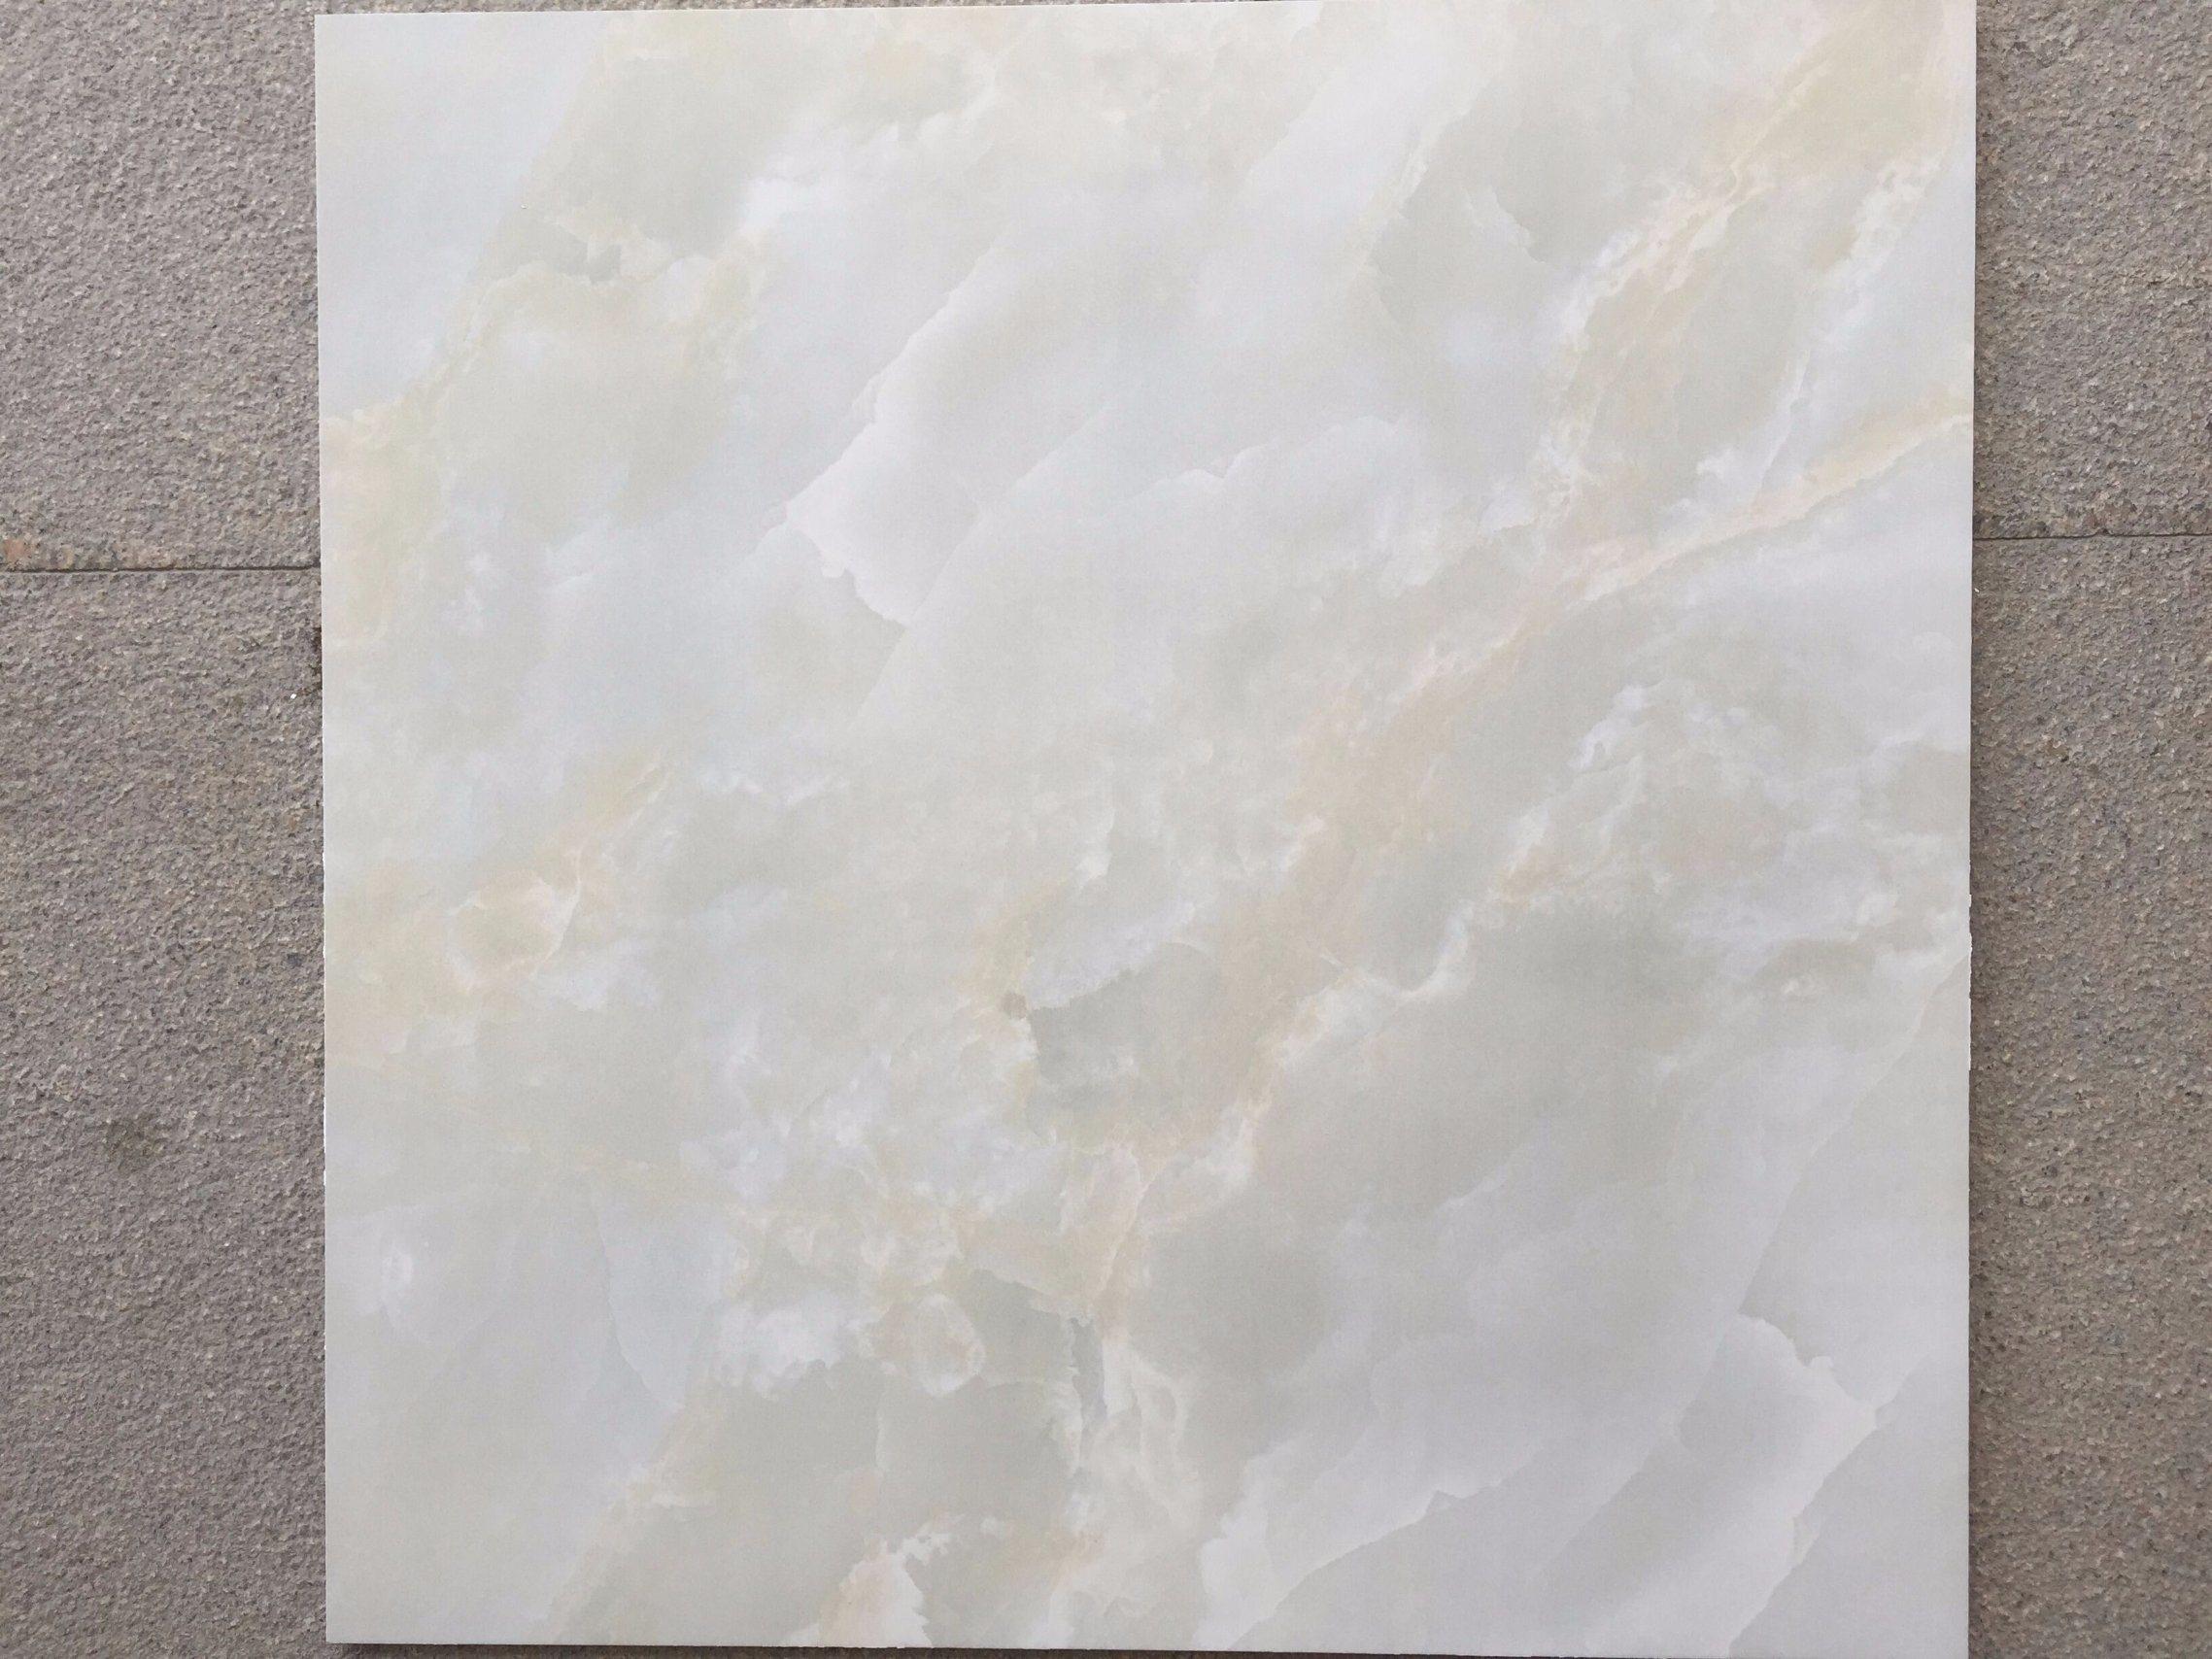 China 600x600mm Grade Aaa Full Polished Glazed Porcelain Floor Tile